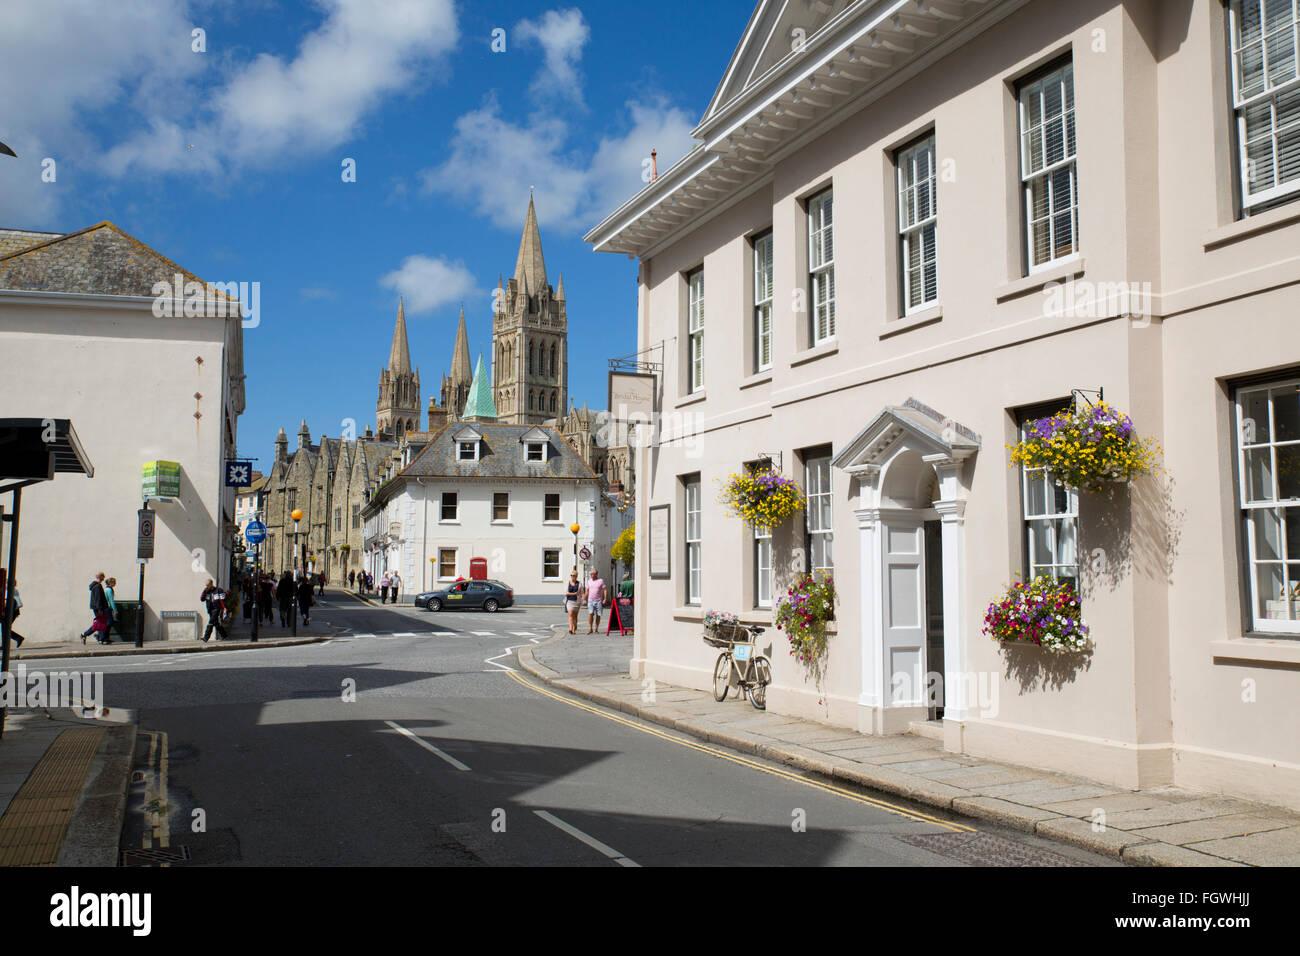 Truro;Princes Street; Cornwall; UK - Stock Image